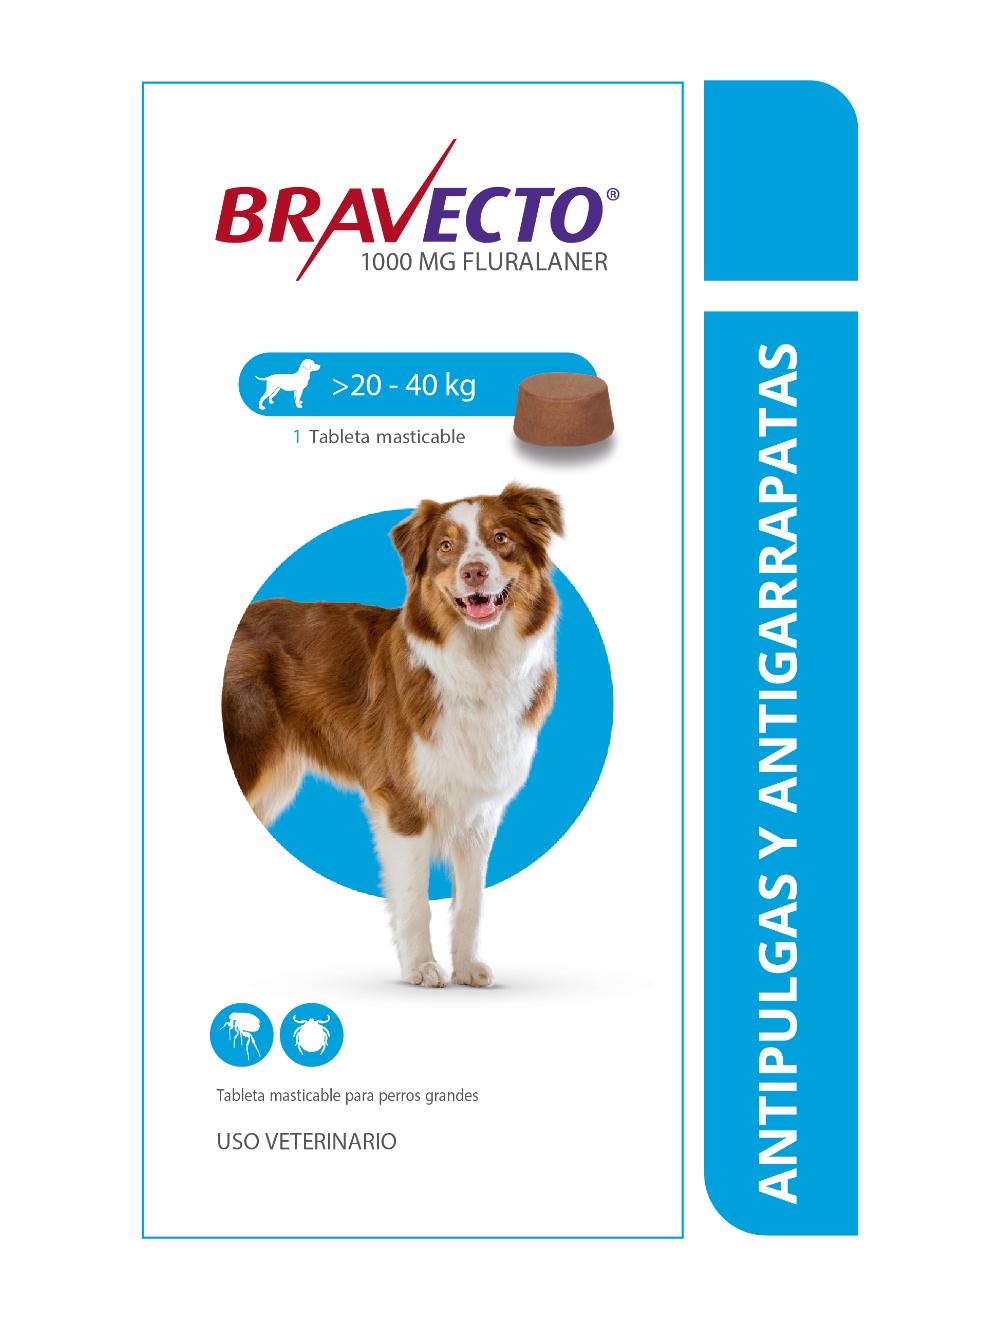 Combo Bravecto Perros de 20 a 40 Kg x 3 unidades - Ciudaddemascotas.com